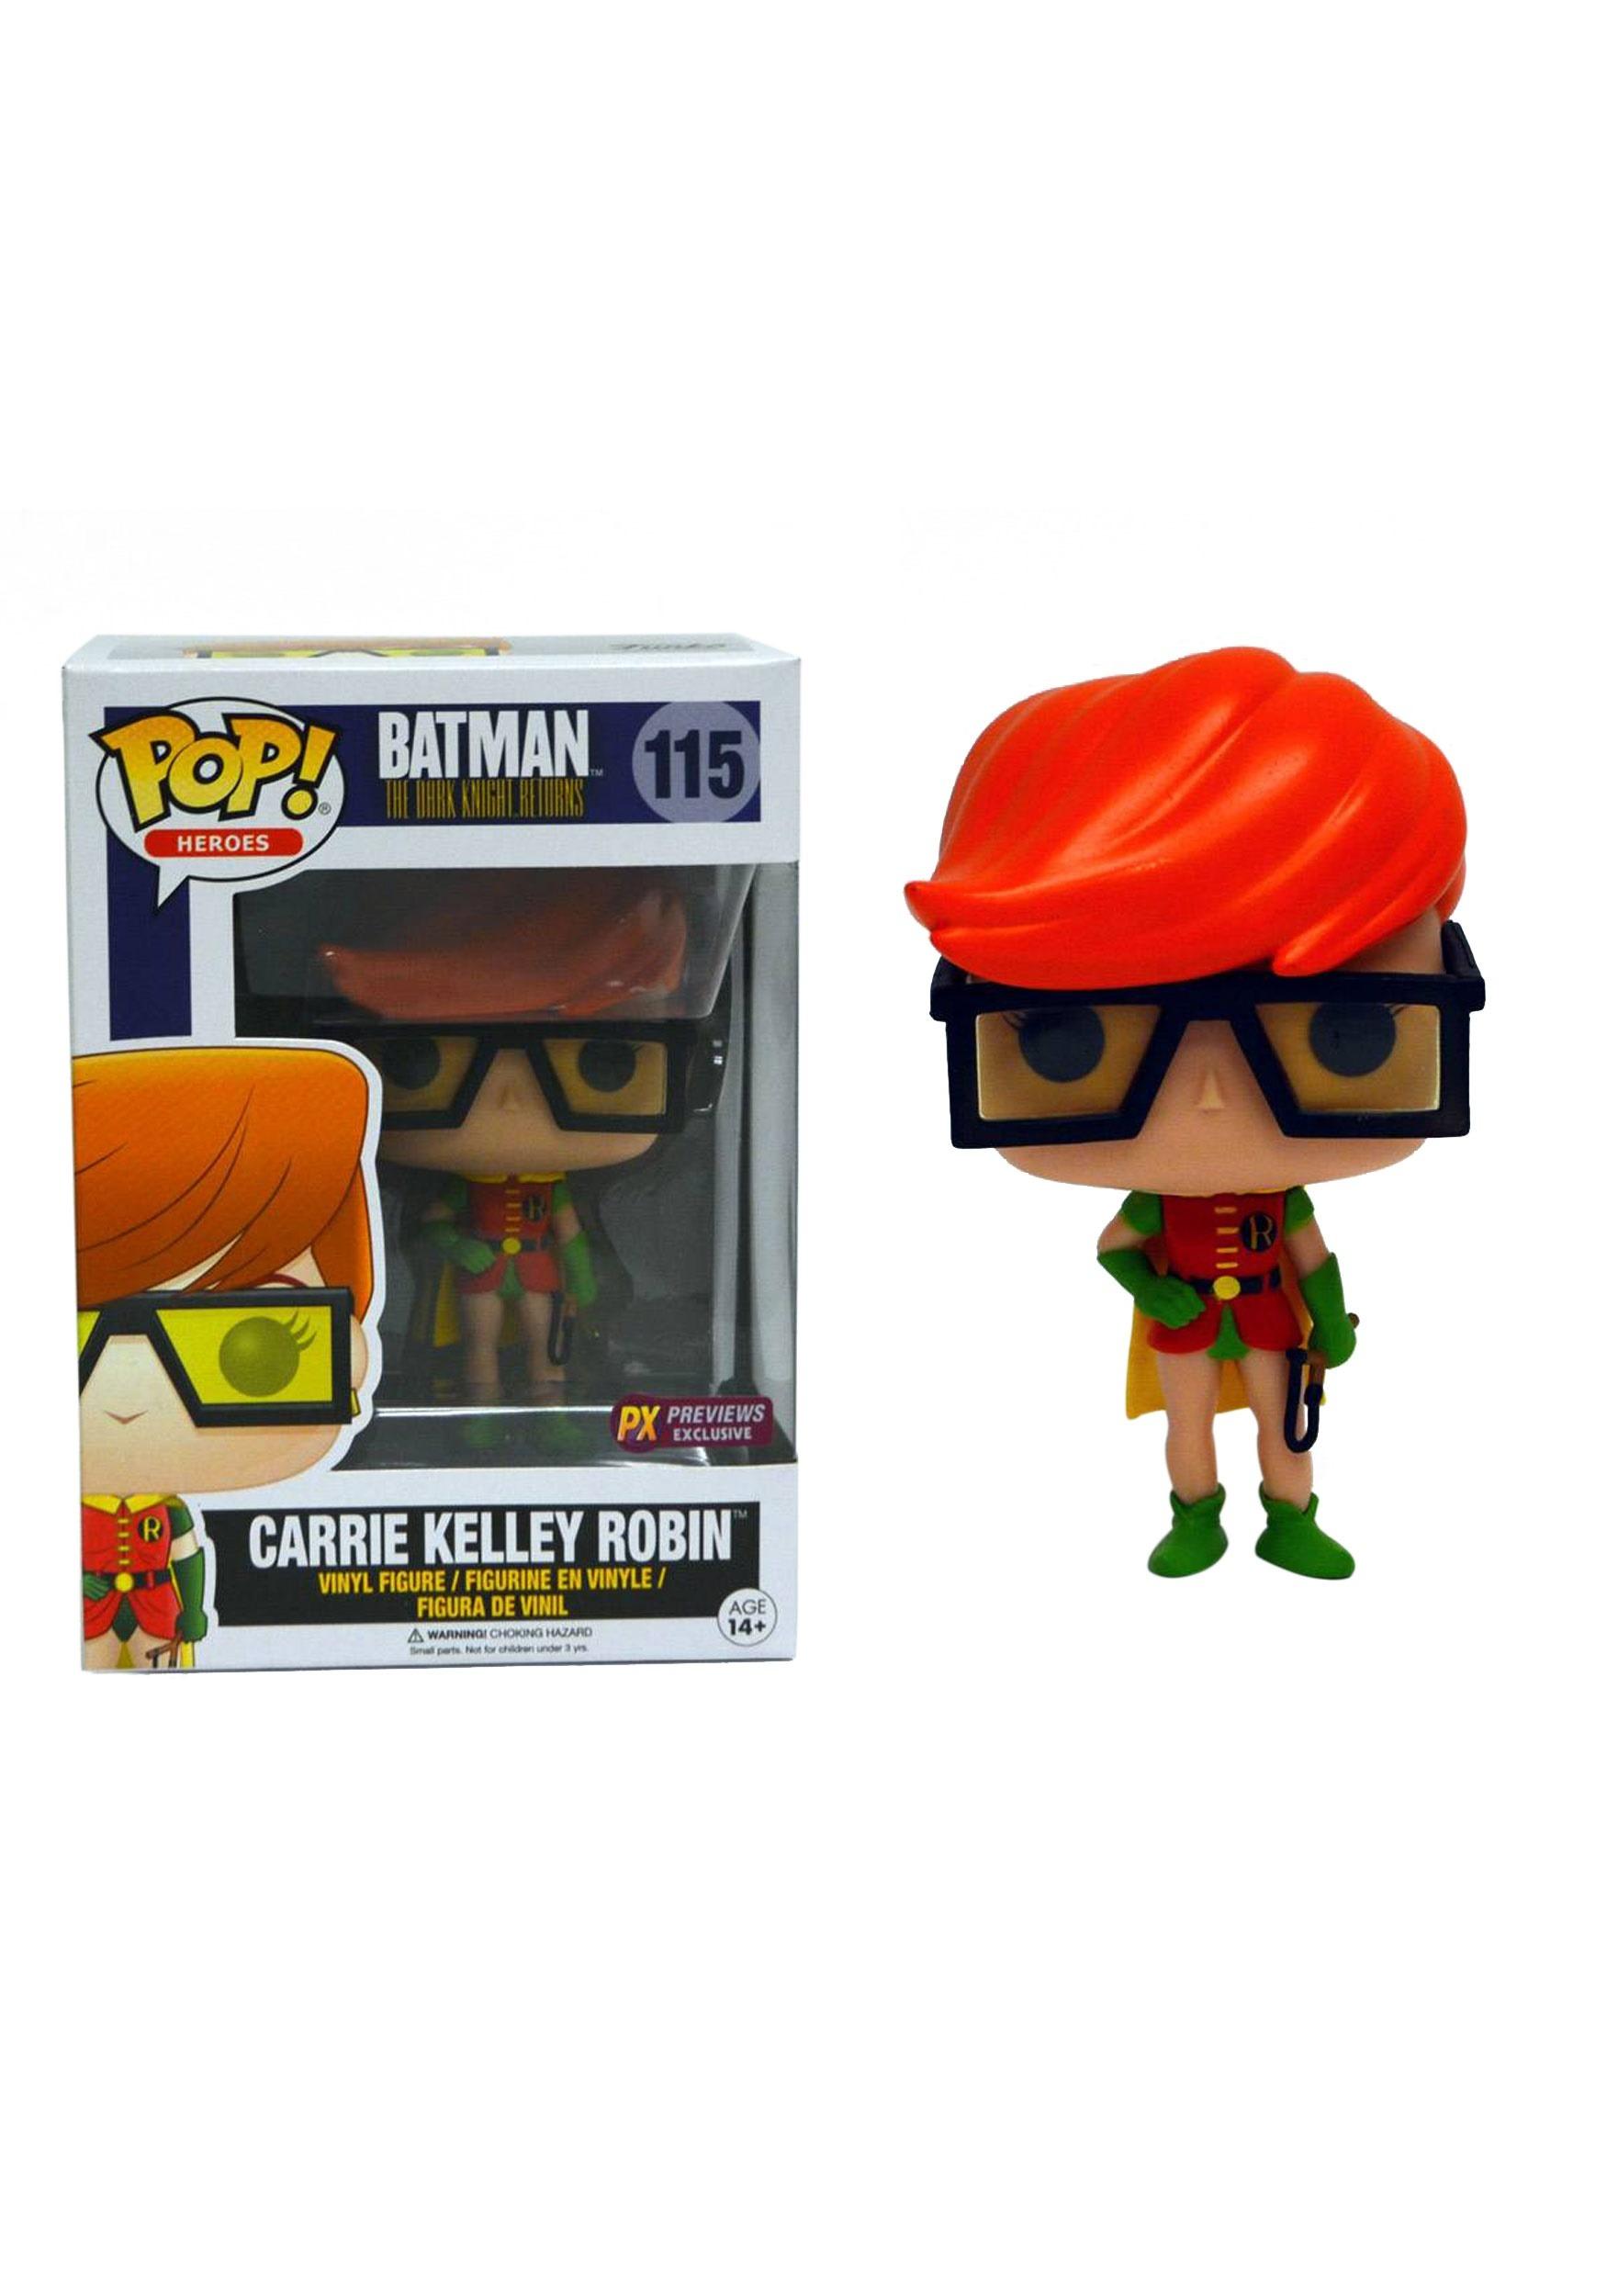 BATMAN CARRIE KELLEY LE ROBIN POP DC: DARK KNIGHT RETURNS